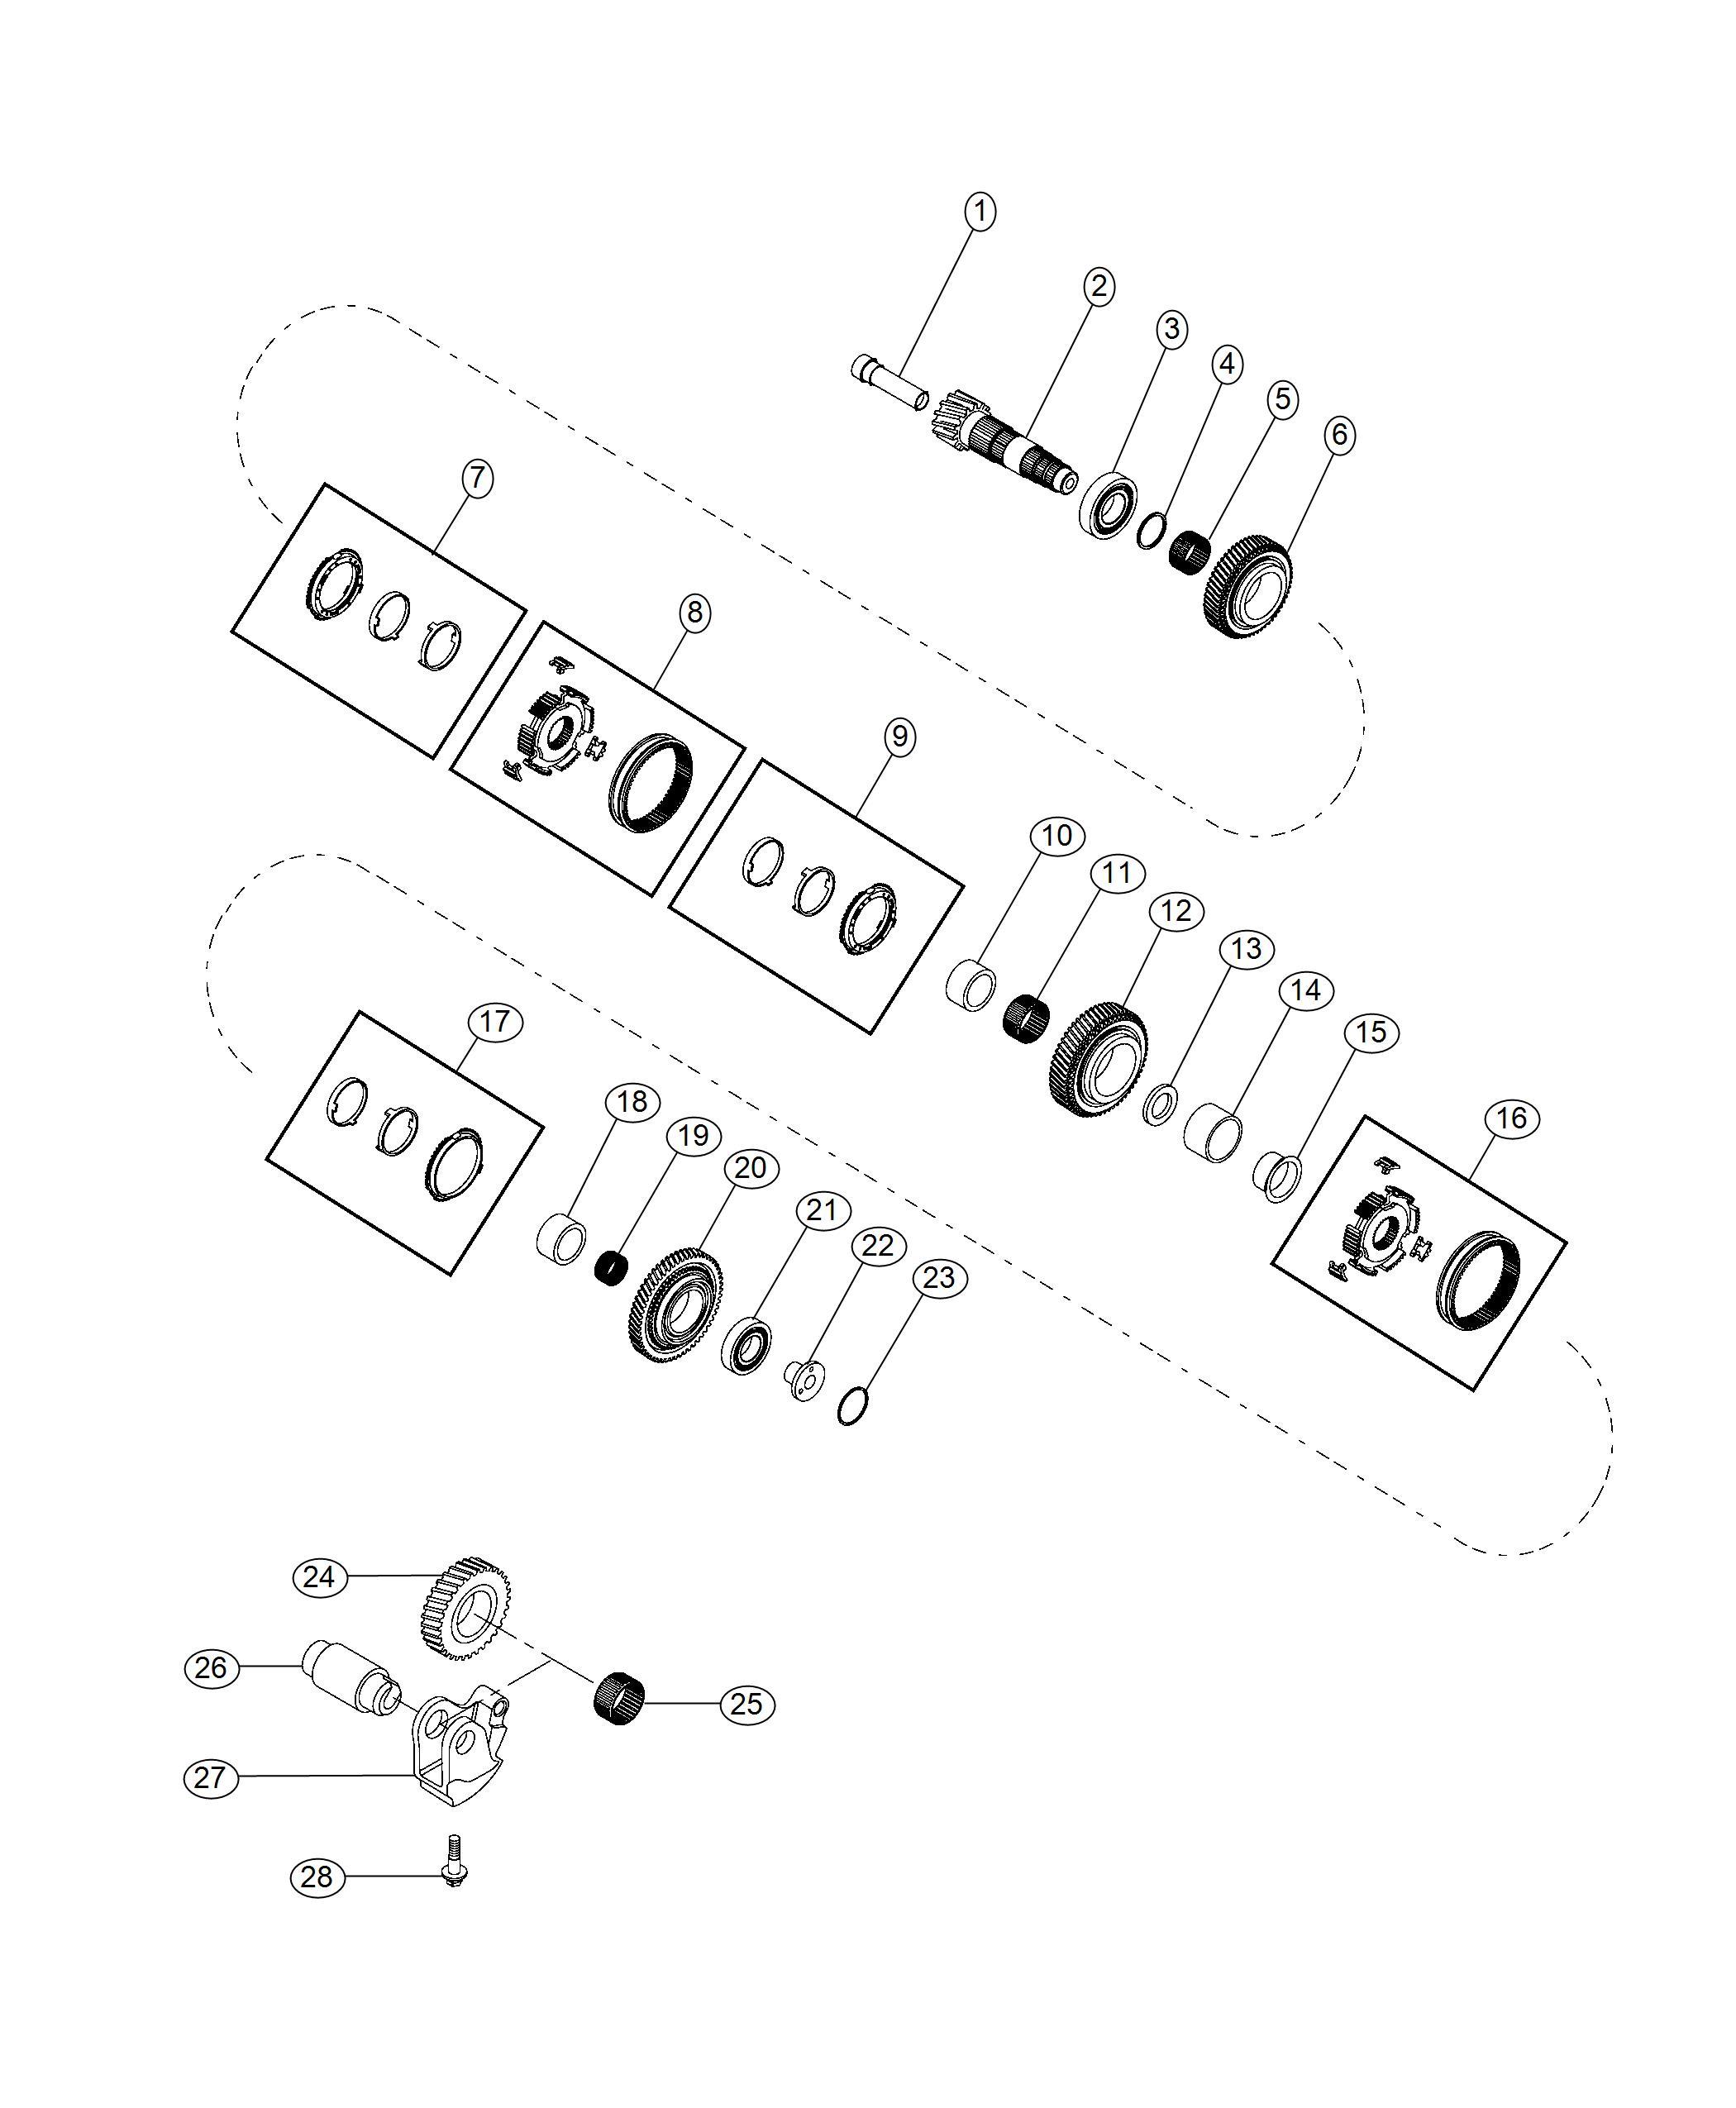 Fiat 500x Countershaft  Shaft  Transmission  Transmission